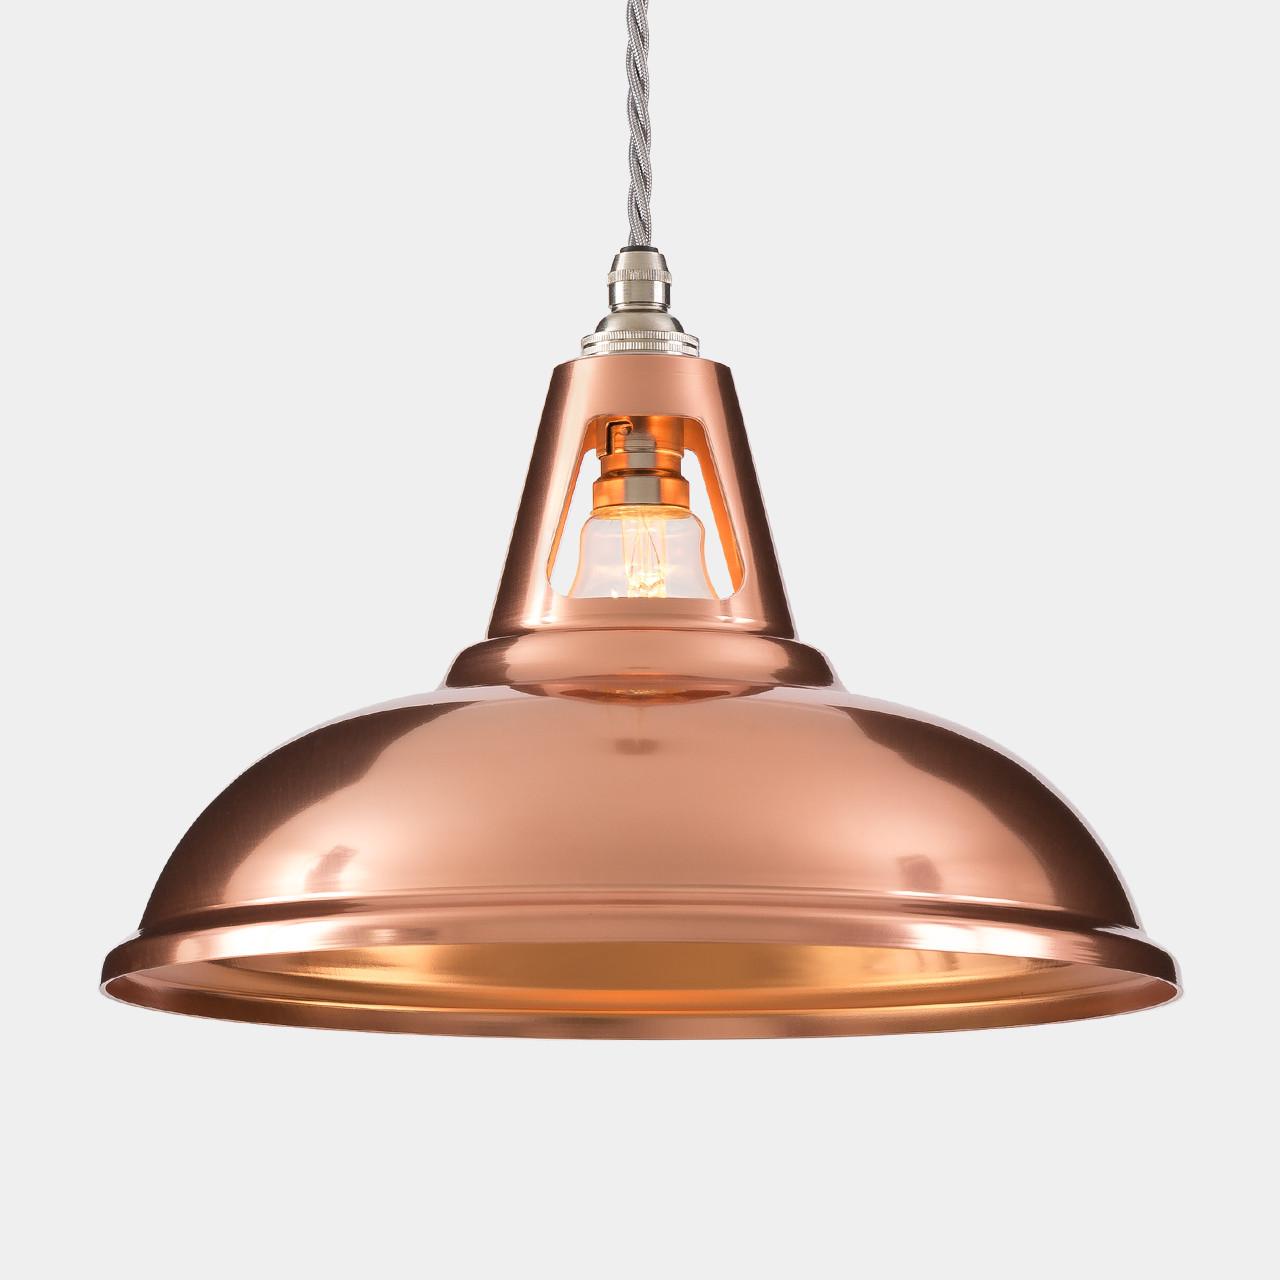 huge discount 0359e 03d23 Coolicon - Copper